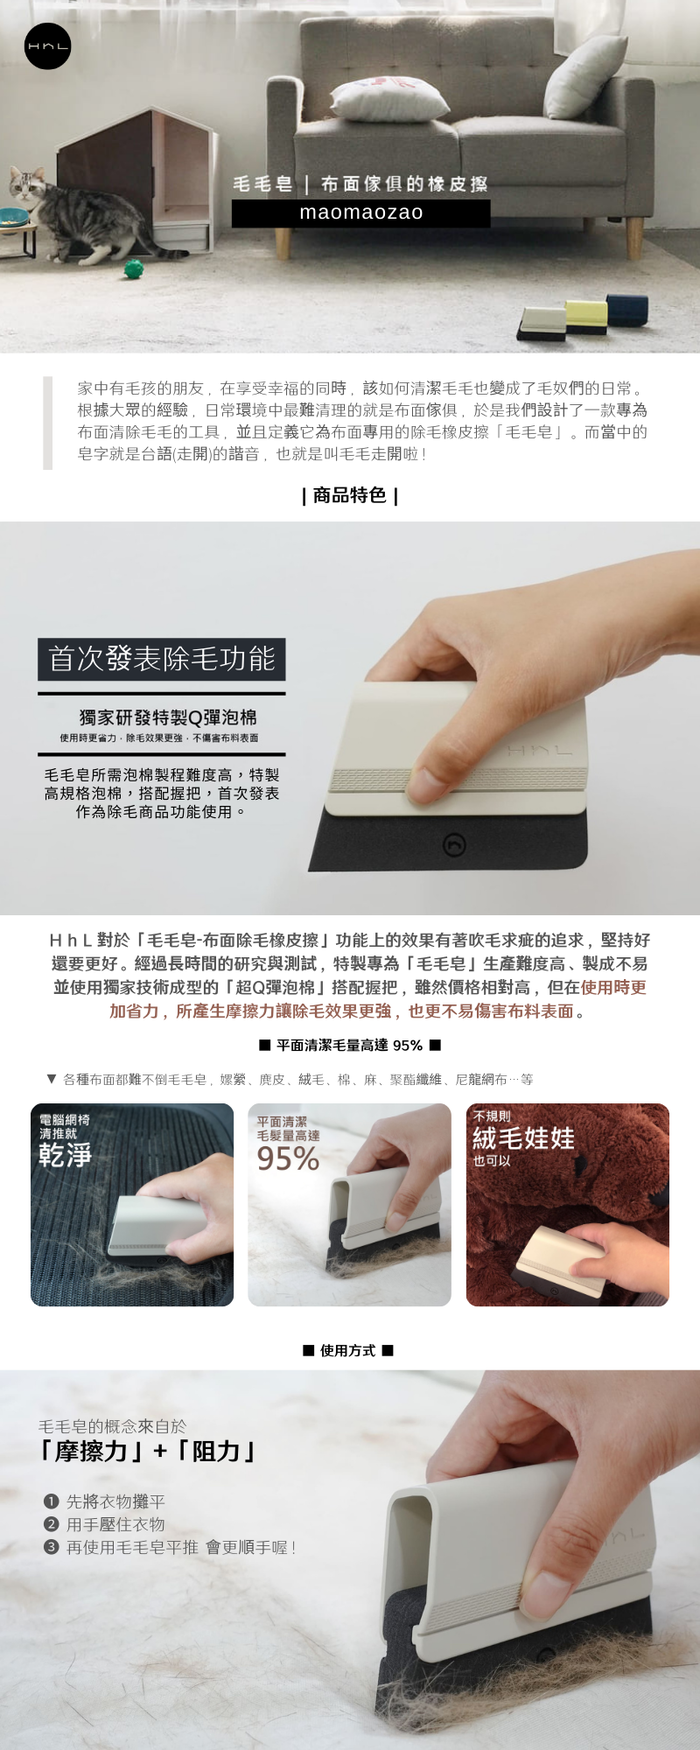 HhL Design | 毛毛皂-布面除毛橡皮擦組(檸檬甜酒黃)